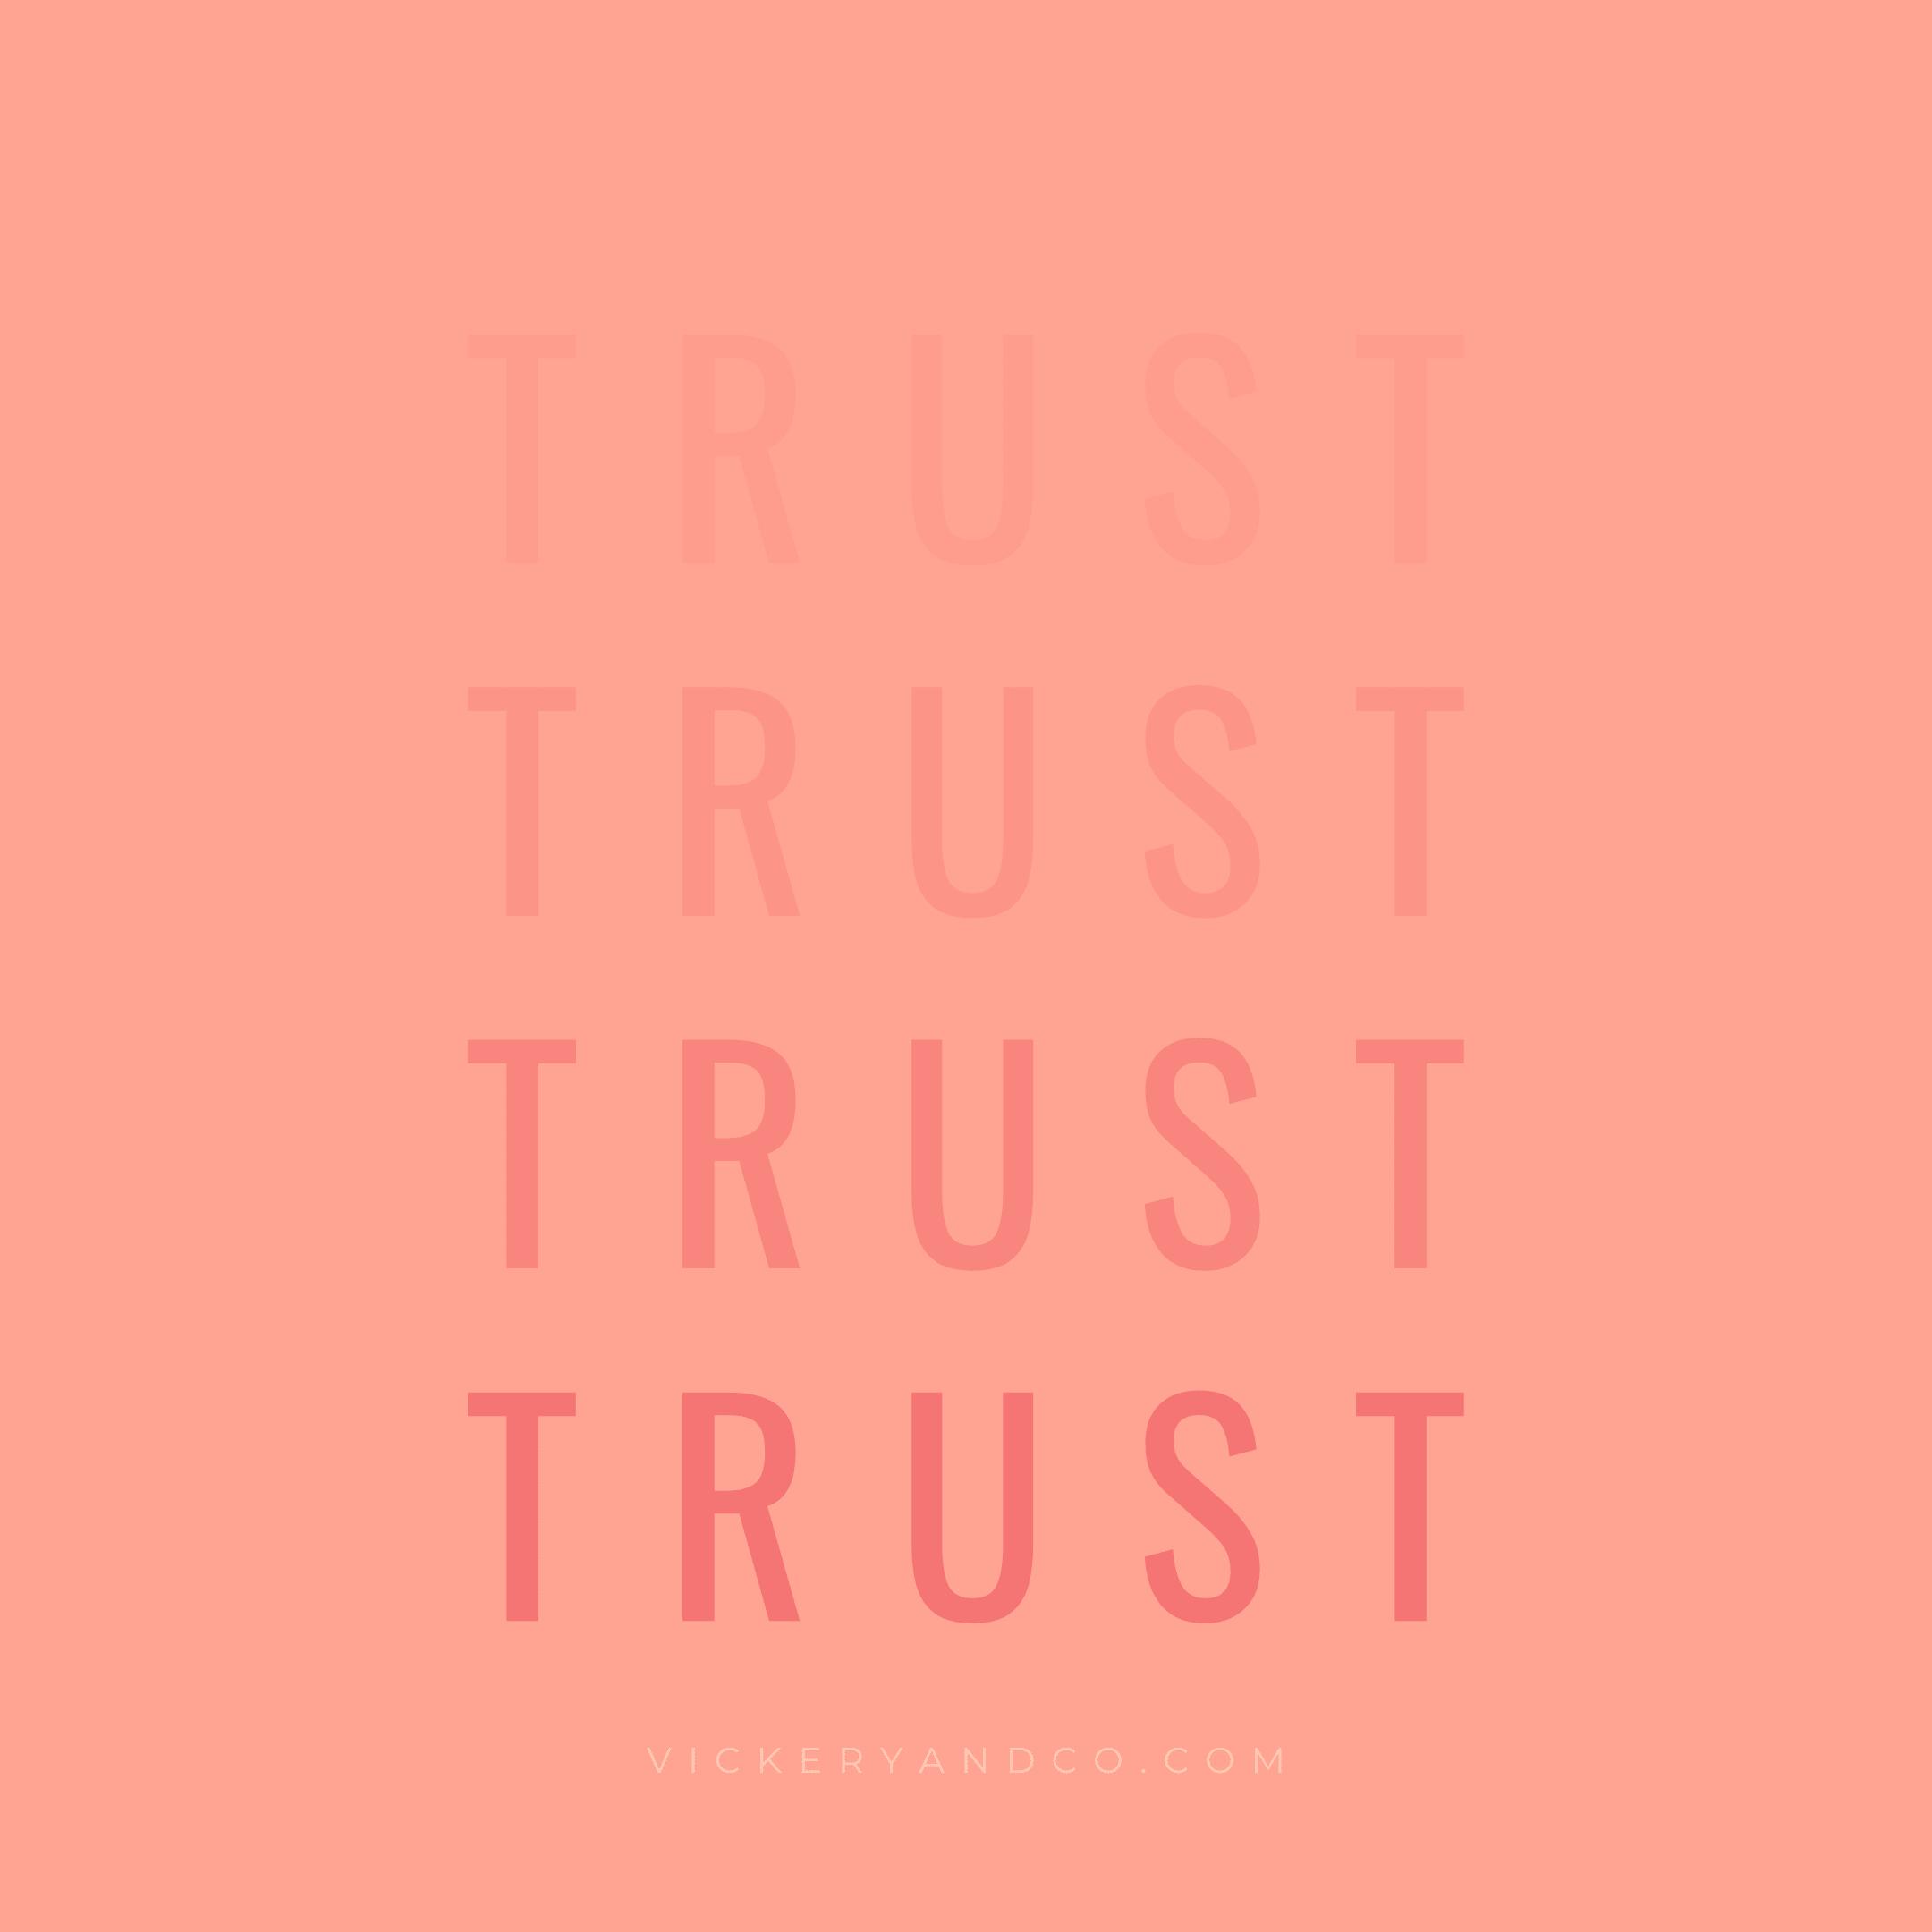 Trust yourself! Heather Vickery, Brave, Leadership, self-trust, entrepreneurship, Vickery and Co.